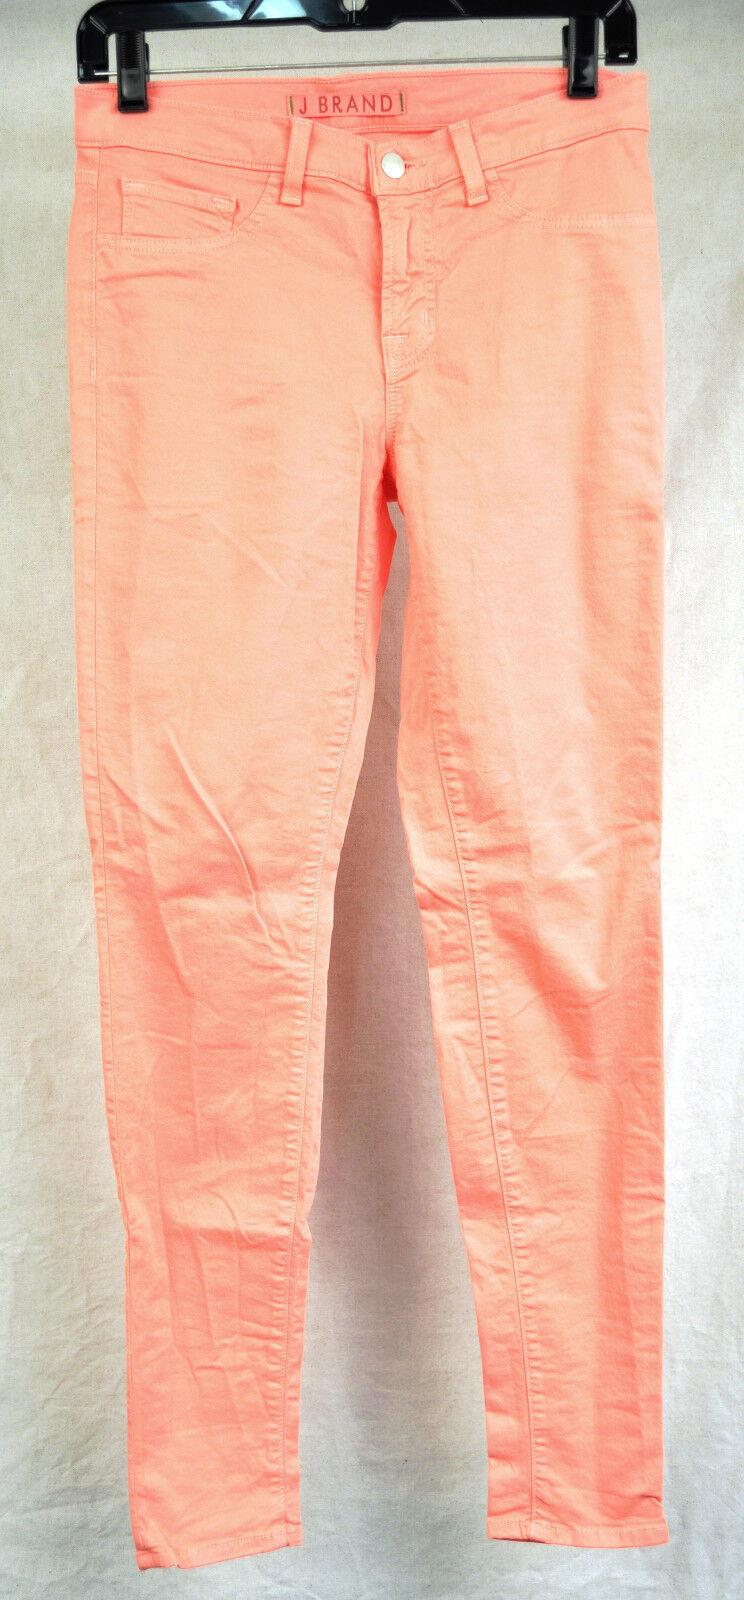 J Brand 811 Skinny Leg Coral Pink Pants 27 USA Womens